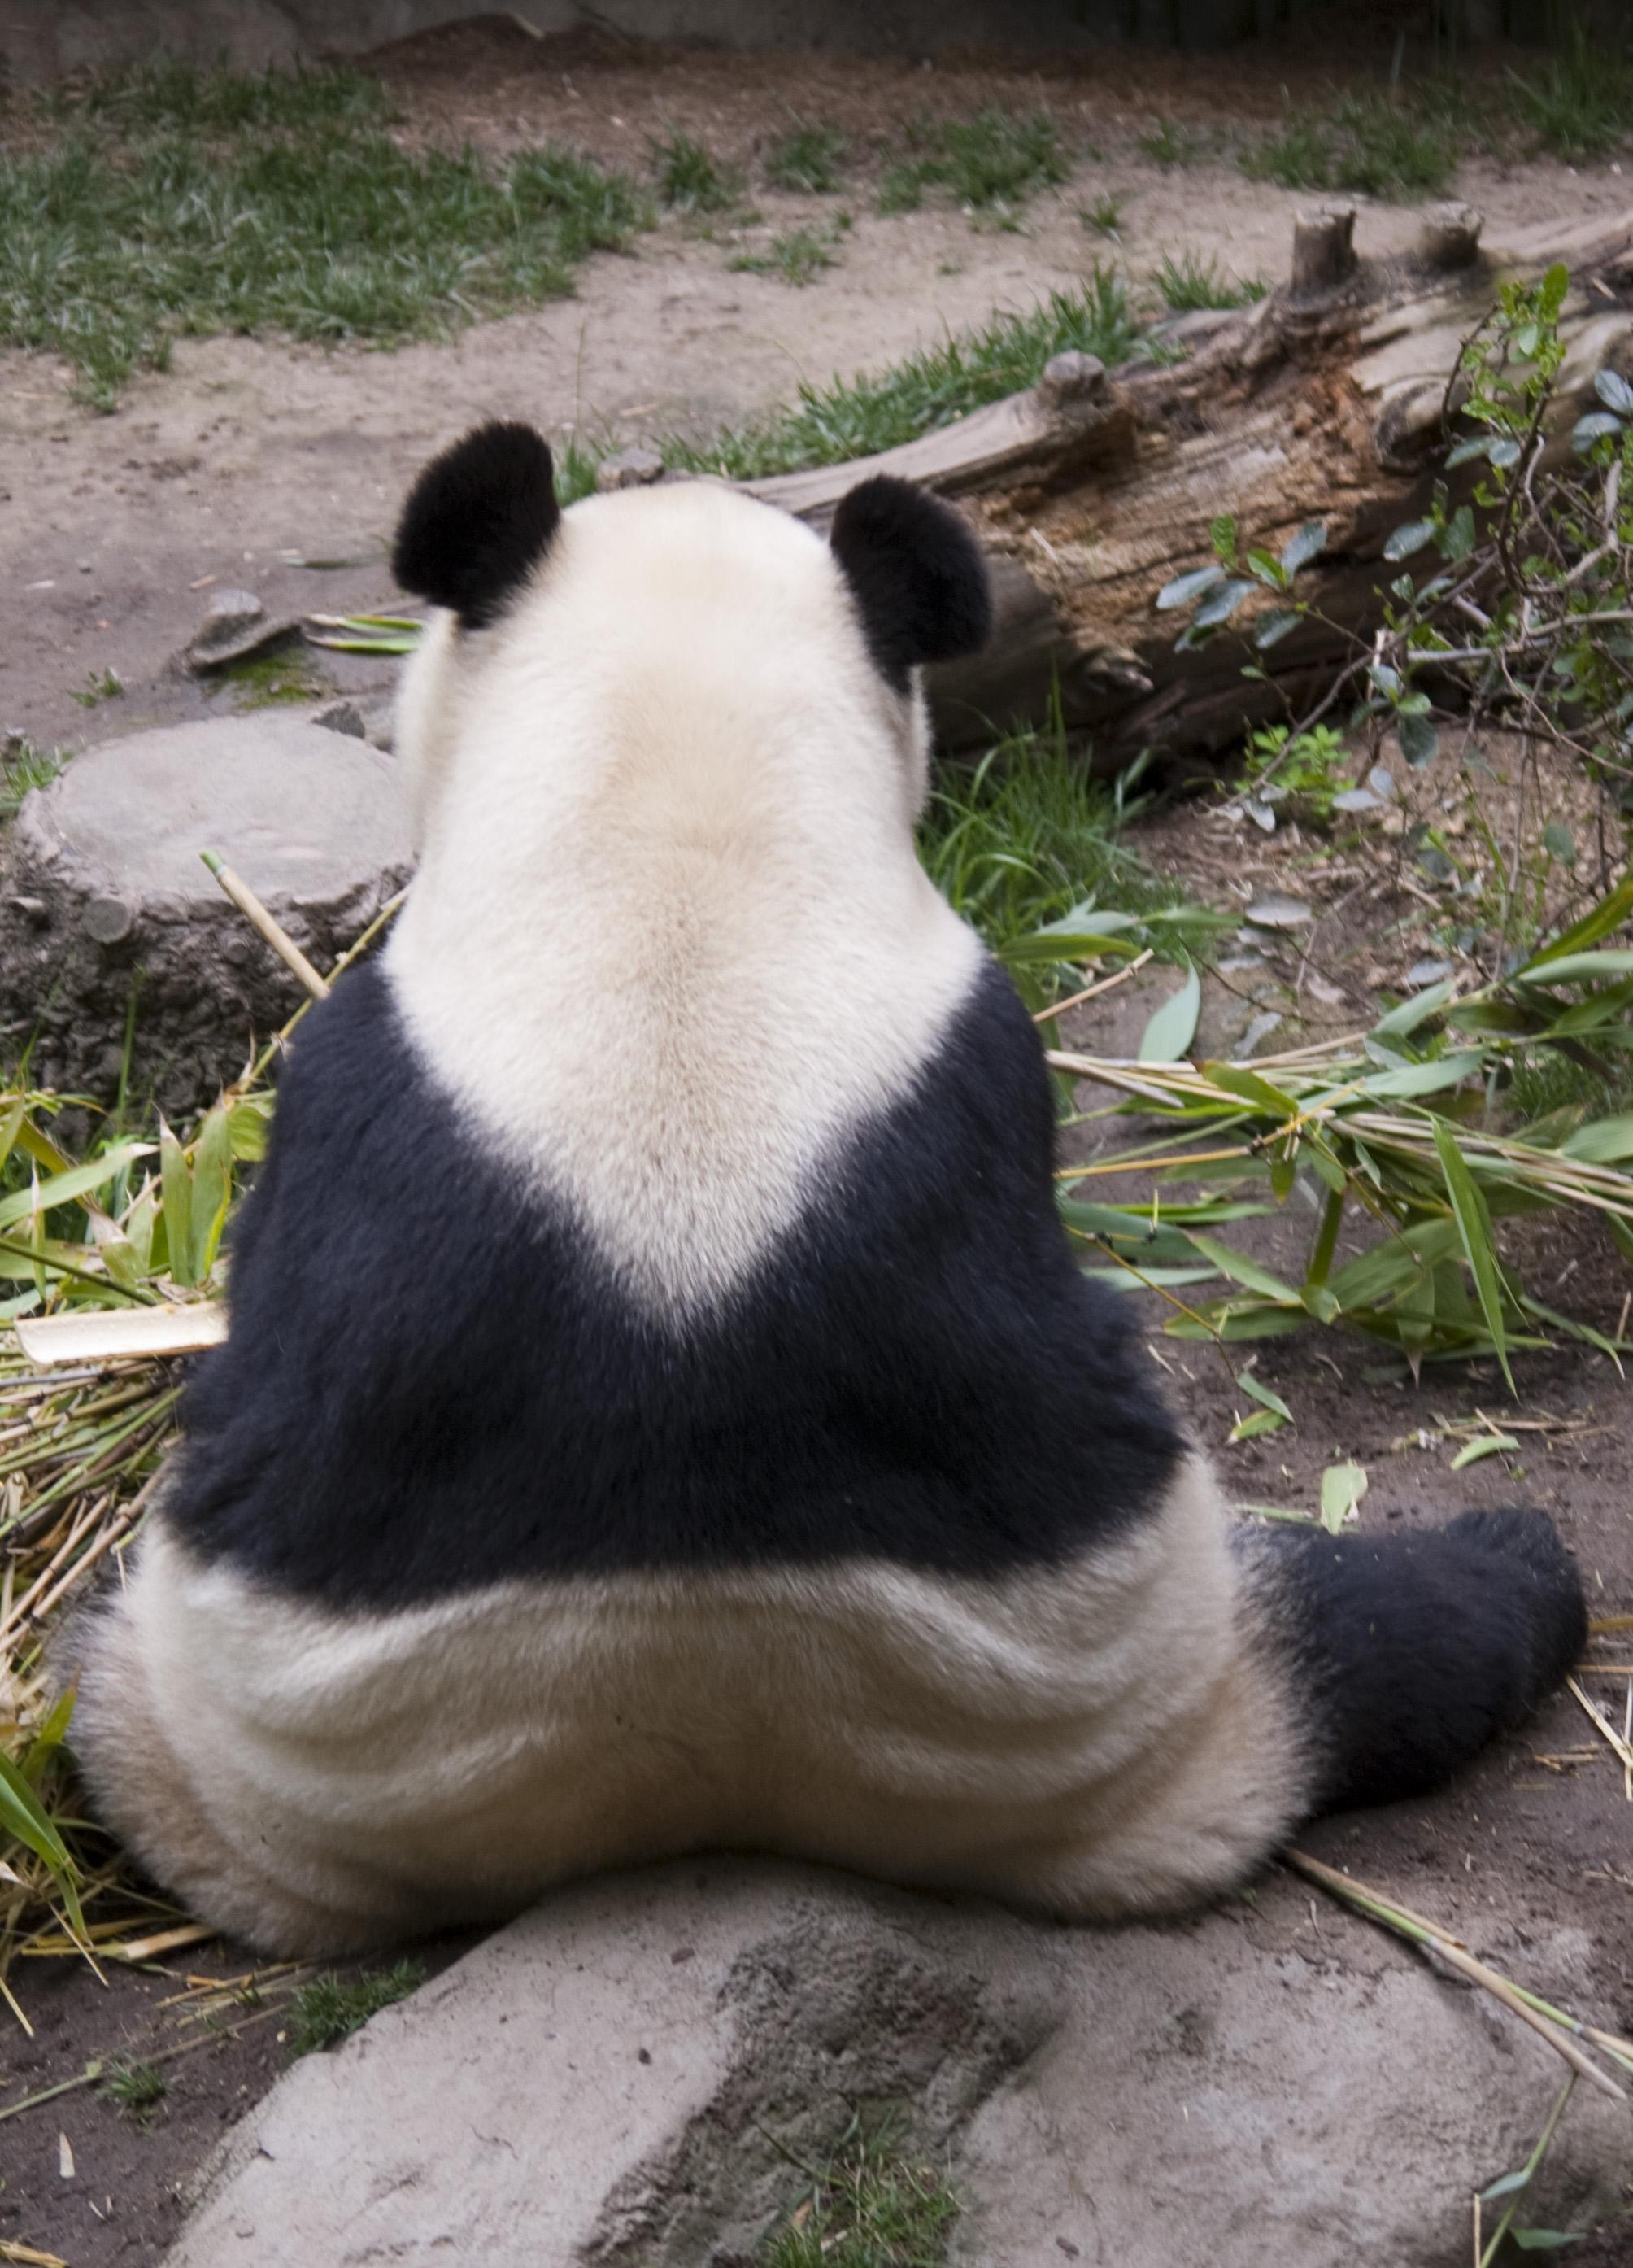 Free Stock Photo 2254 Panda Back Freeimageslive